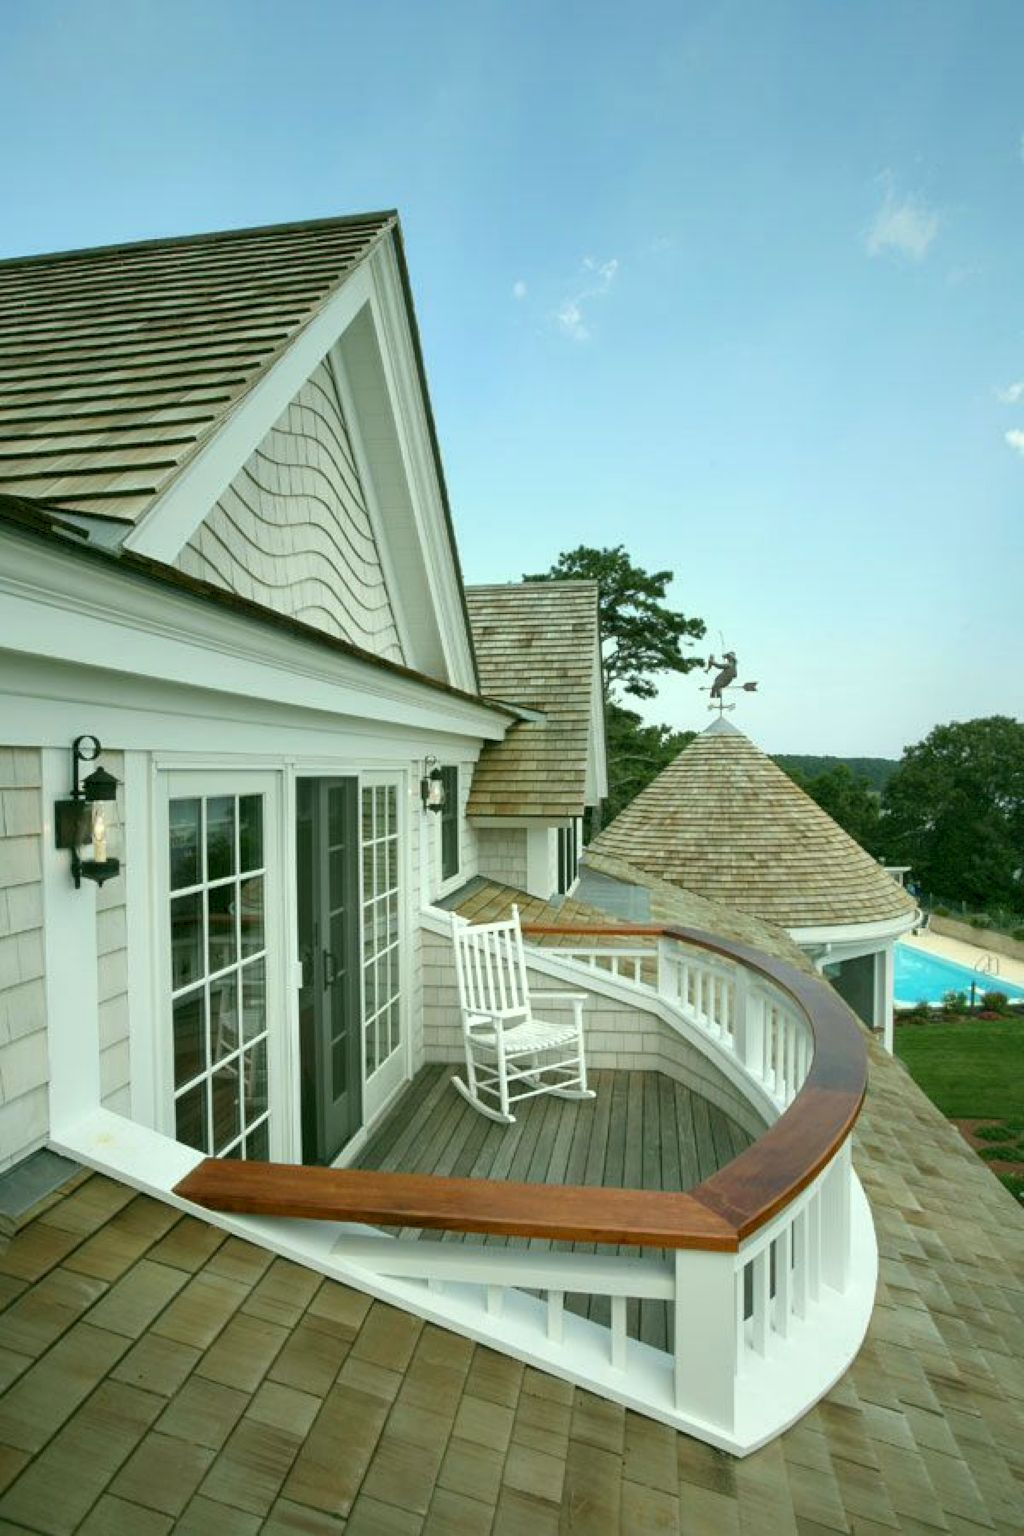 50 Traditional Cape Cod House Exterior Ideas